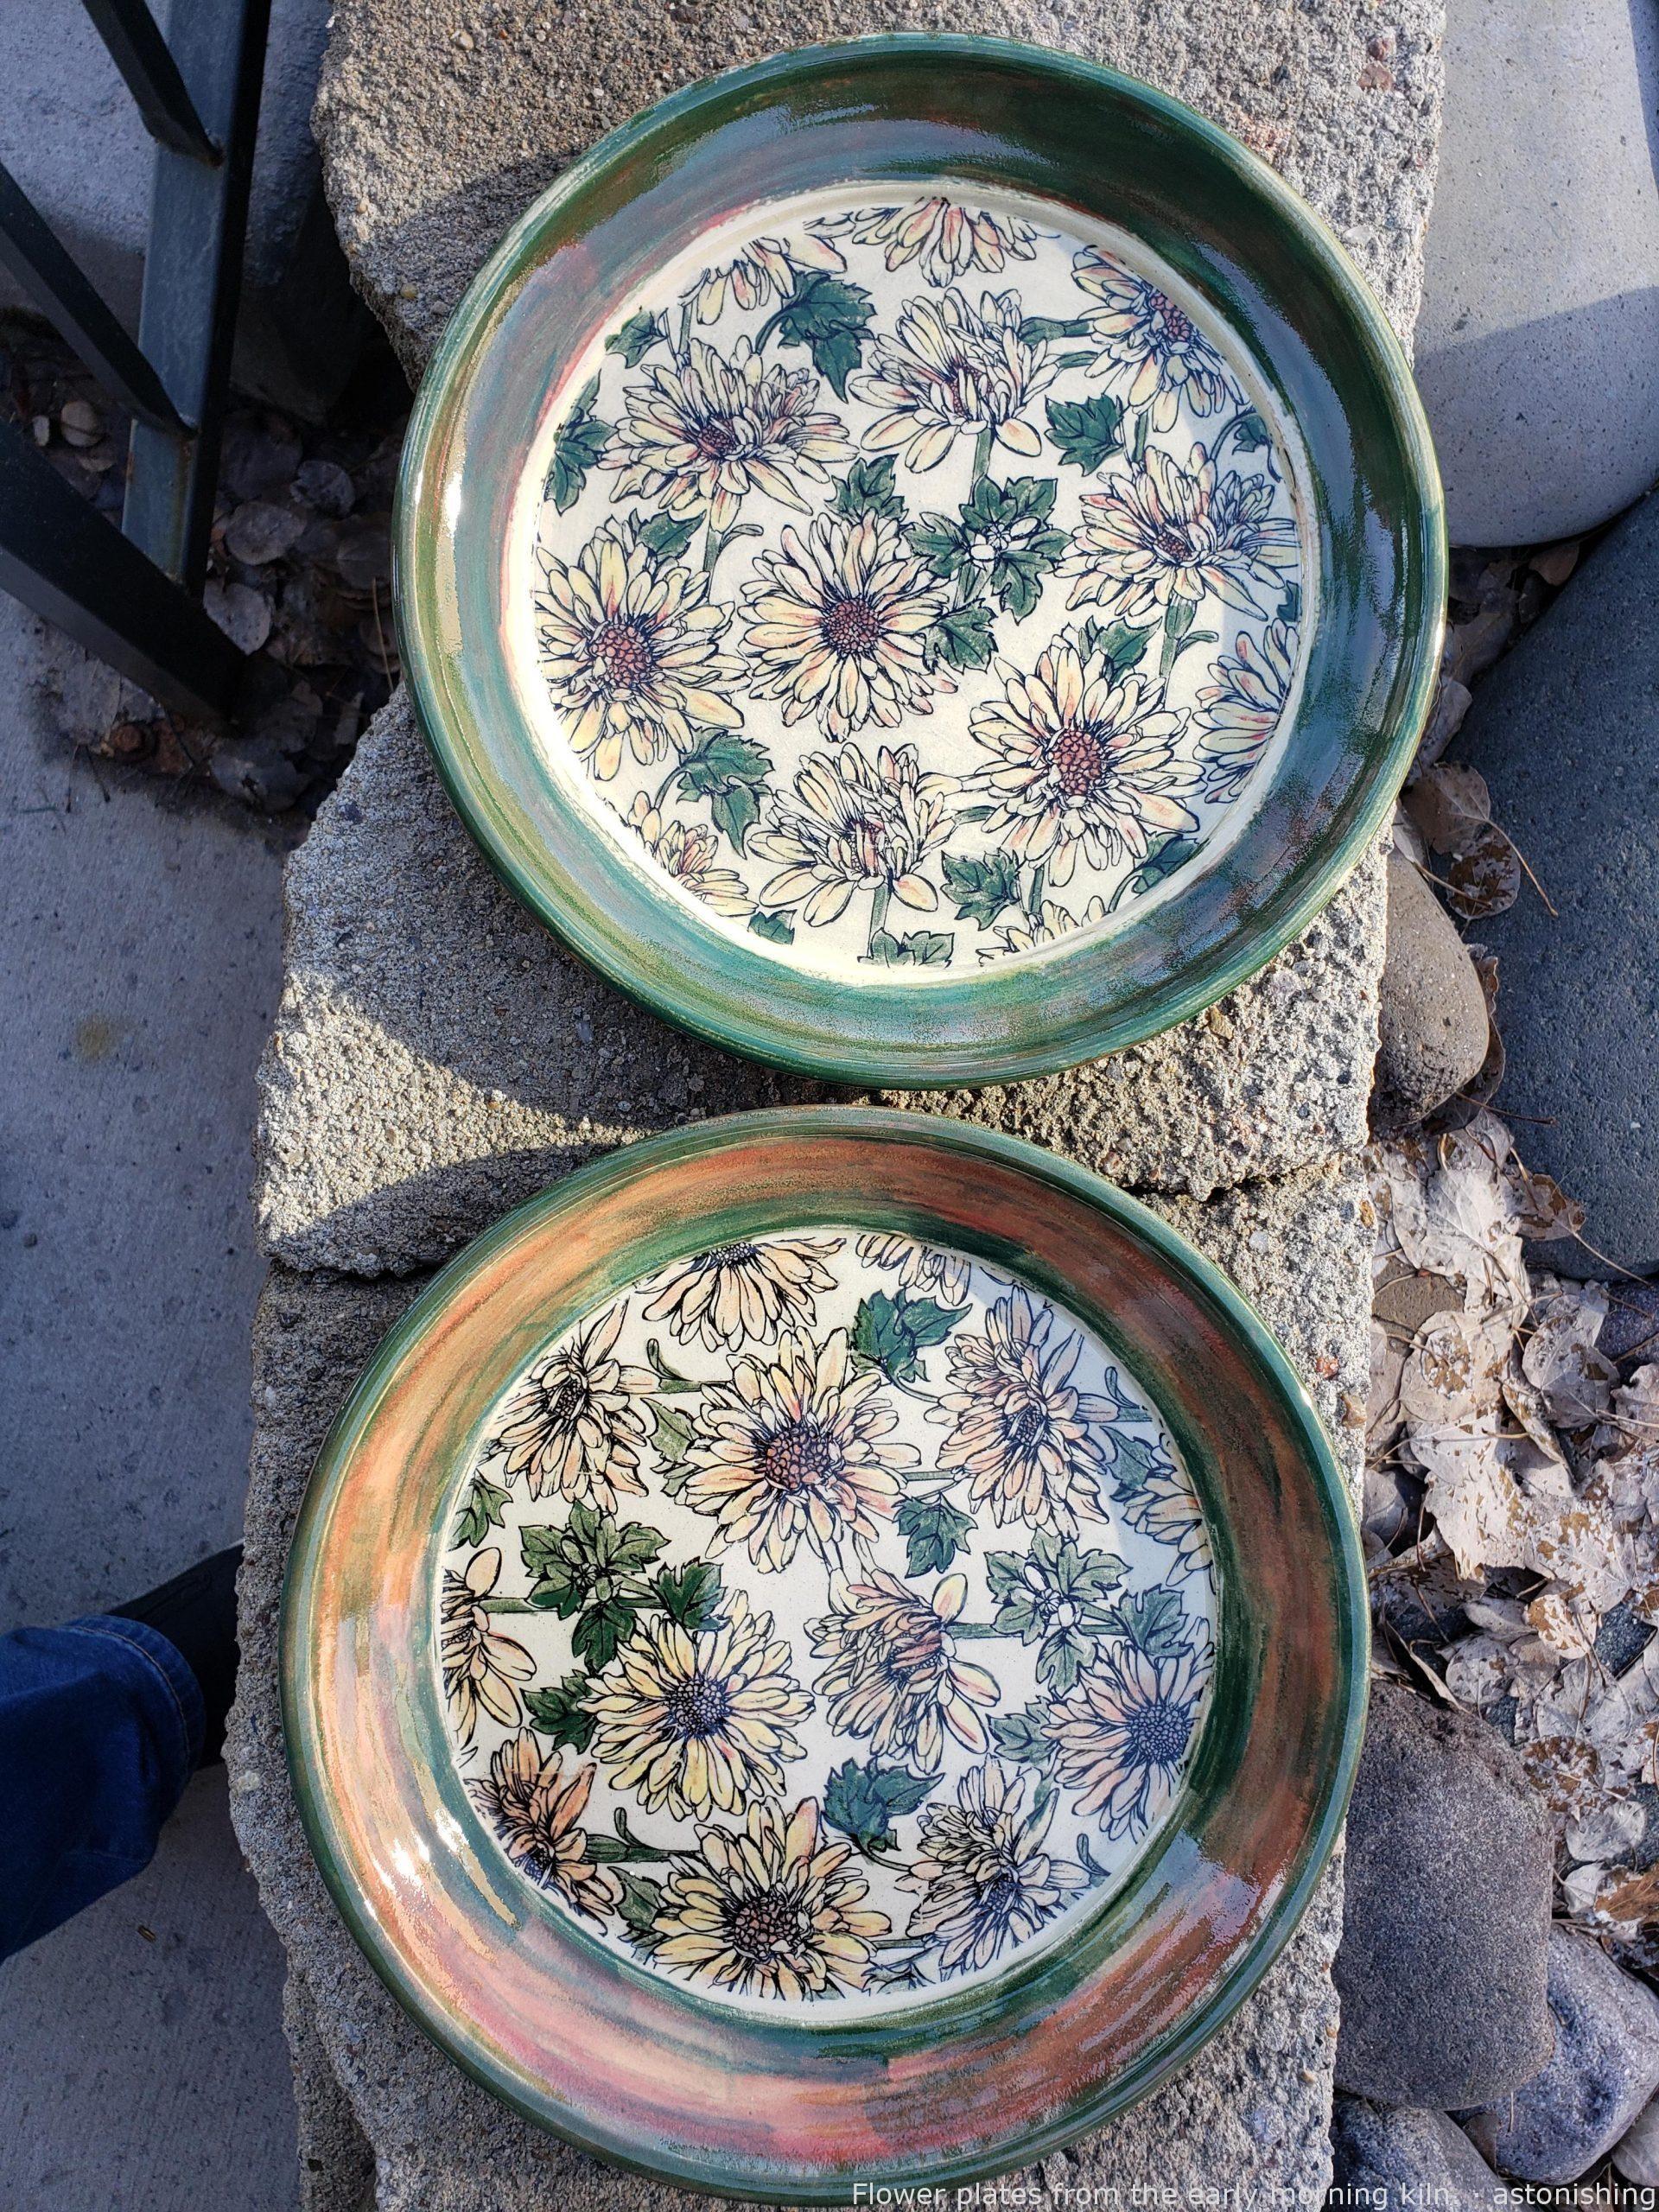 Flower plates from the early morning kiln. · astonishing |  #claypottery #handmadeceramic #potteryceramics #potterydecor #potterydesign